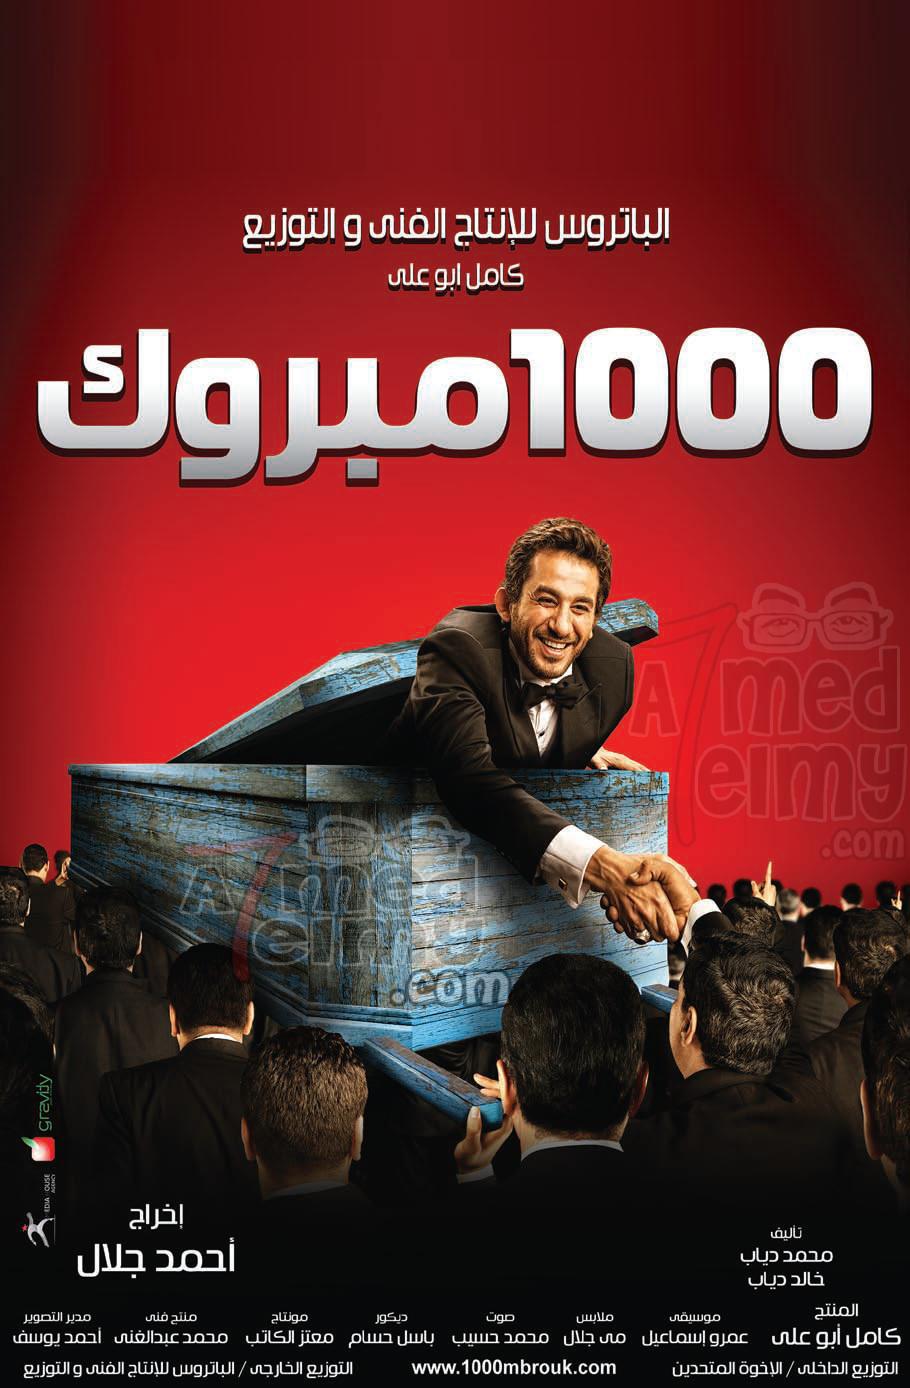 1000 Mabrook ١٠٠٠ مبروك